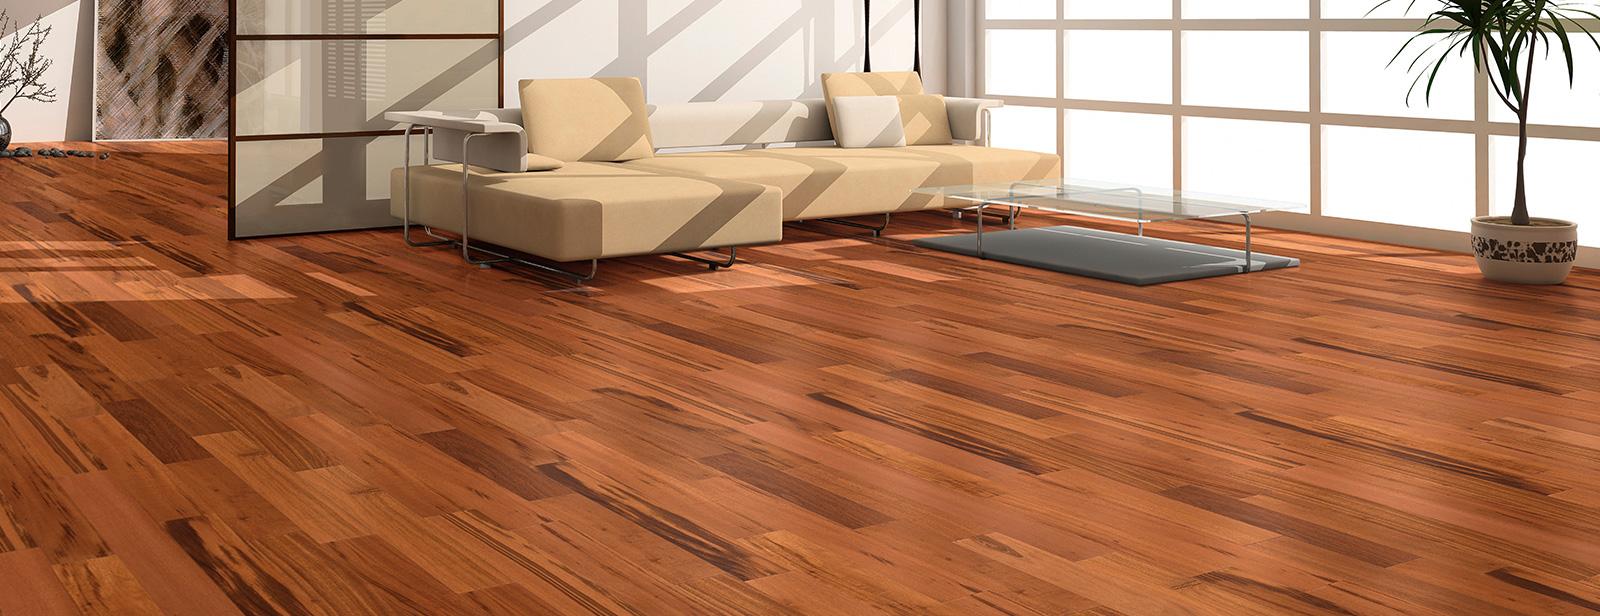 vinyl resilient sawmillhickory natural laminate hardwood flooring mannington floors residential com luxury